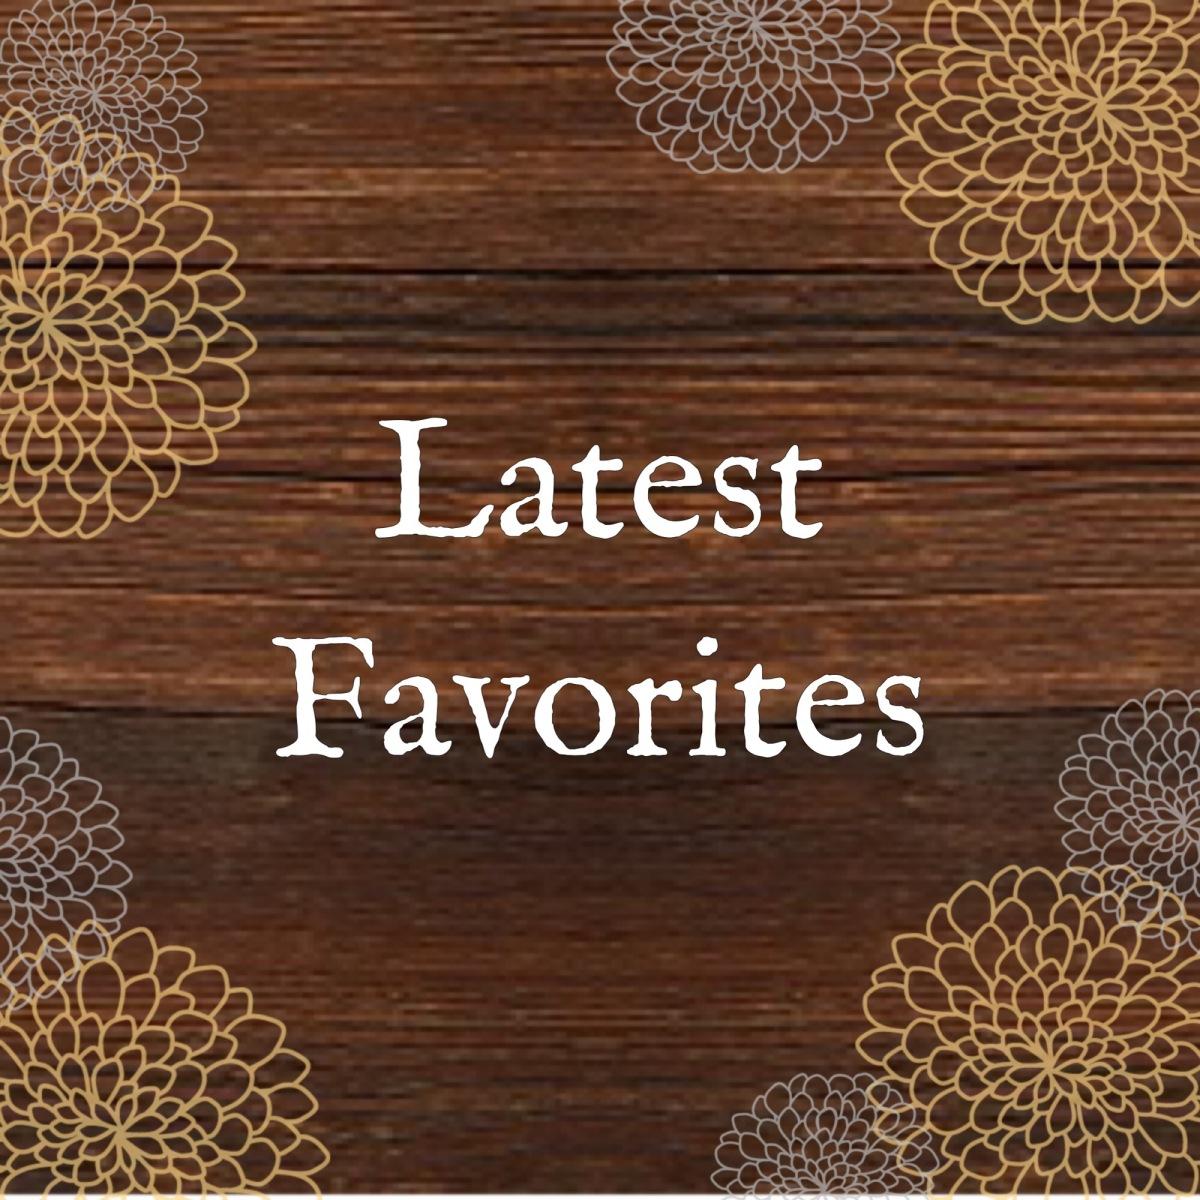 Latest Favorites